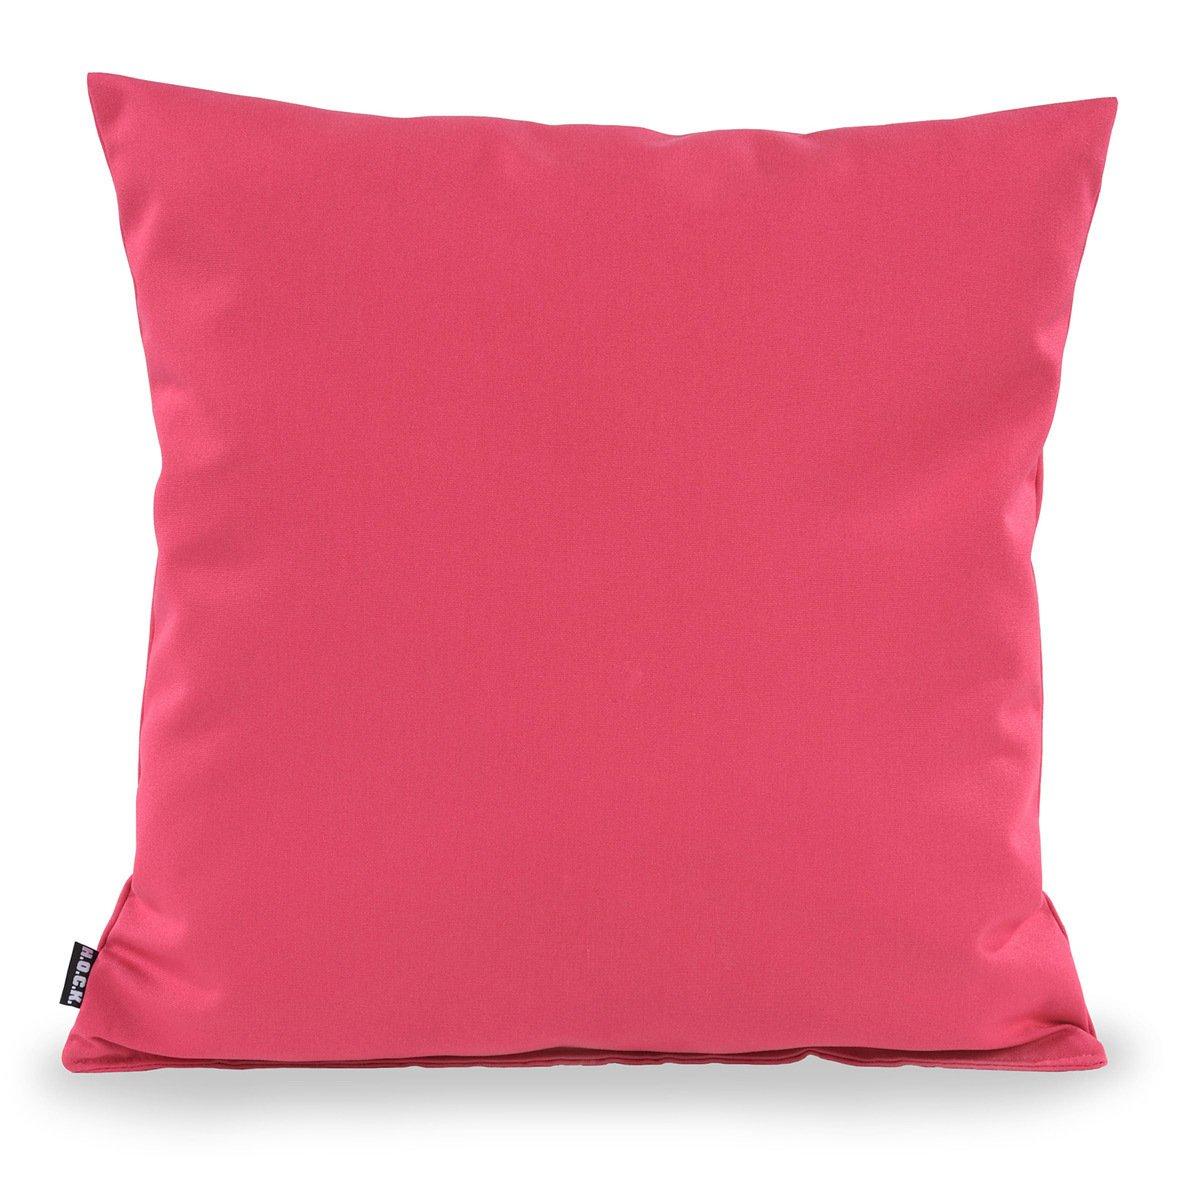 H.O.C.K. Kissen 50x50cm Outdoor Classic uni pink kaufen